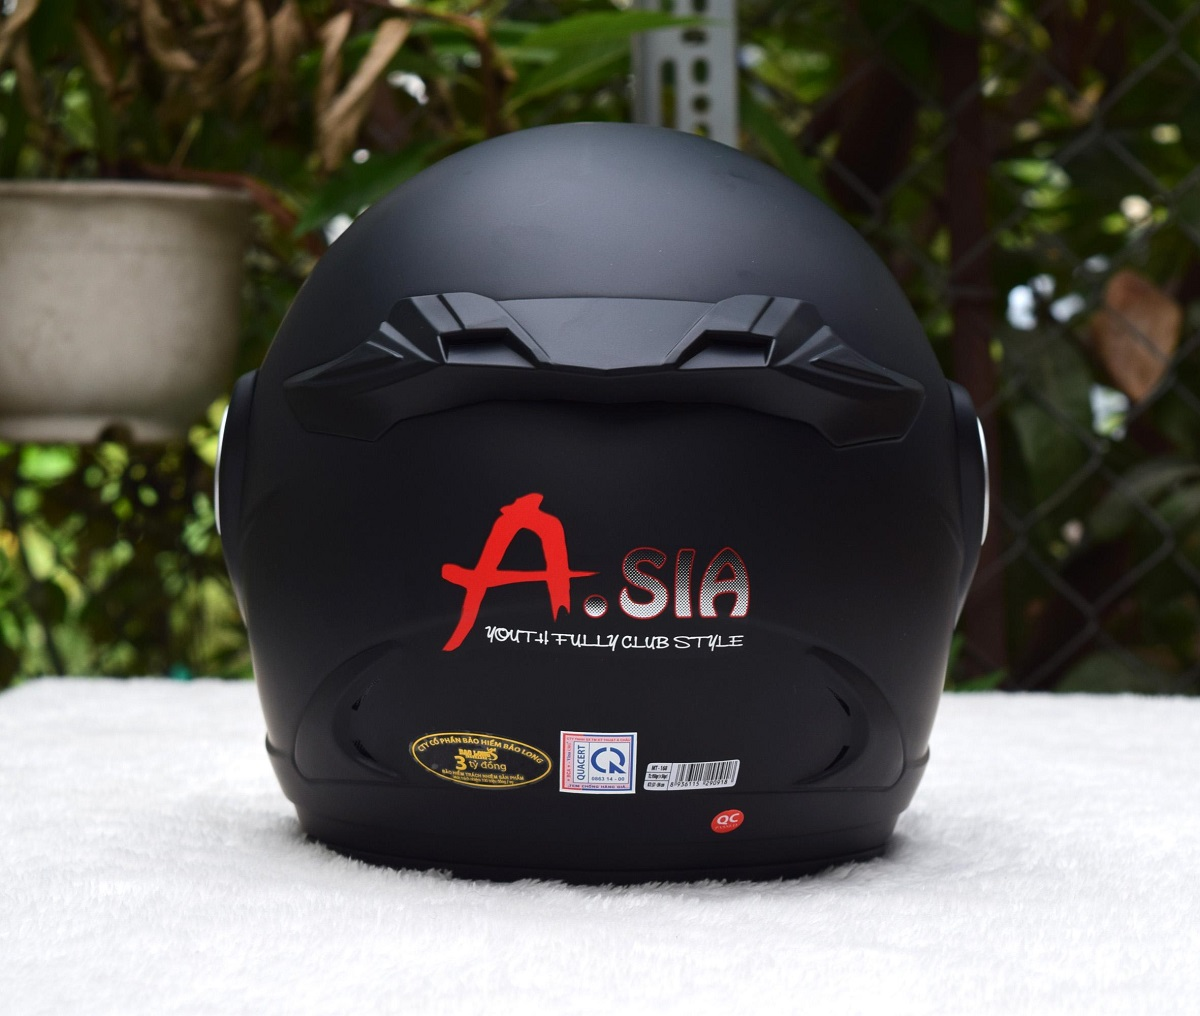 Mũ Bảo Hiểm Asia MT168 Đen Nhám Size L